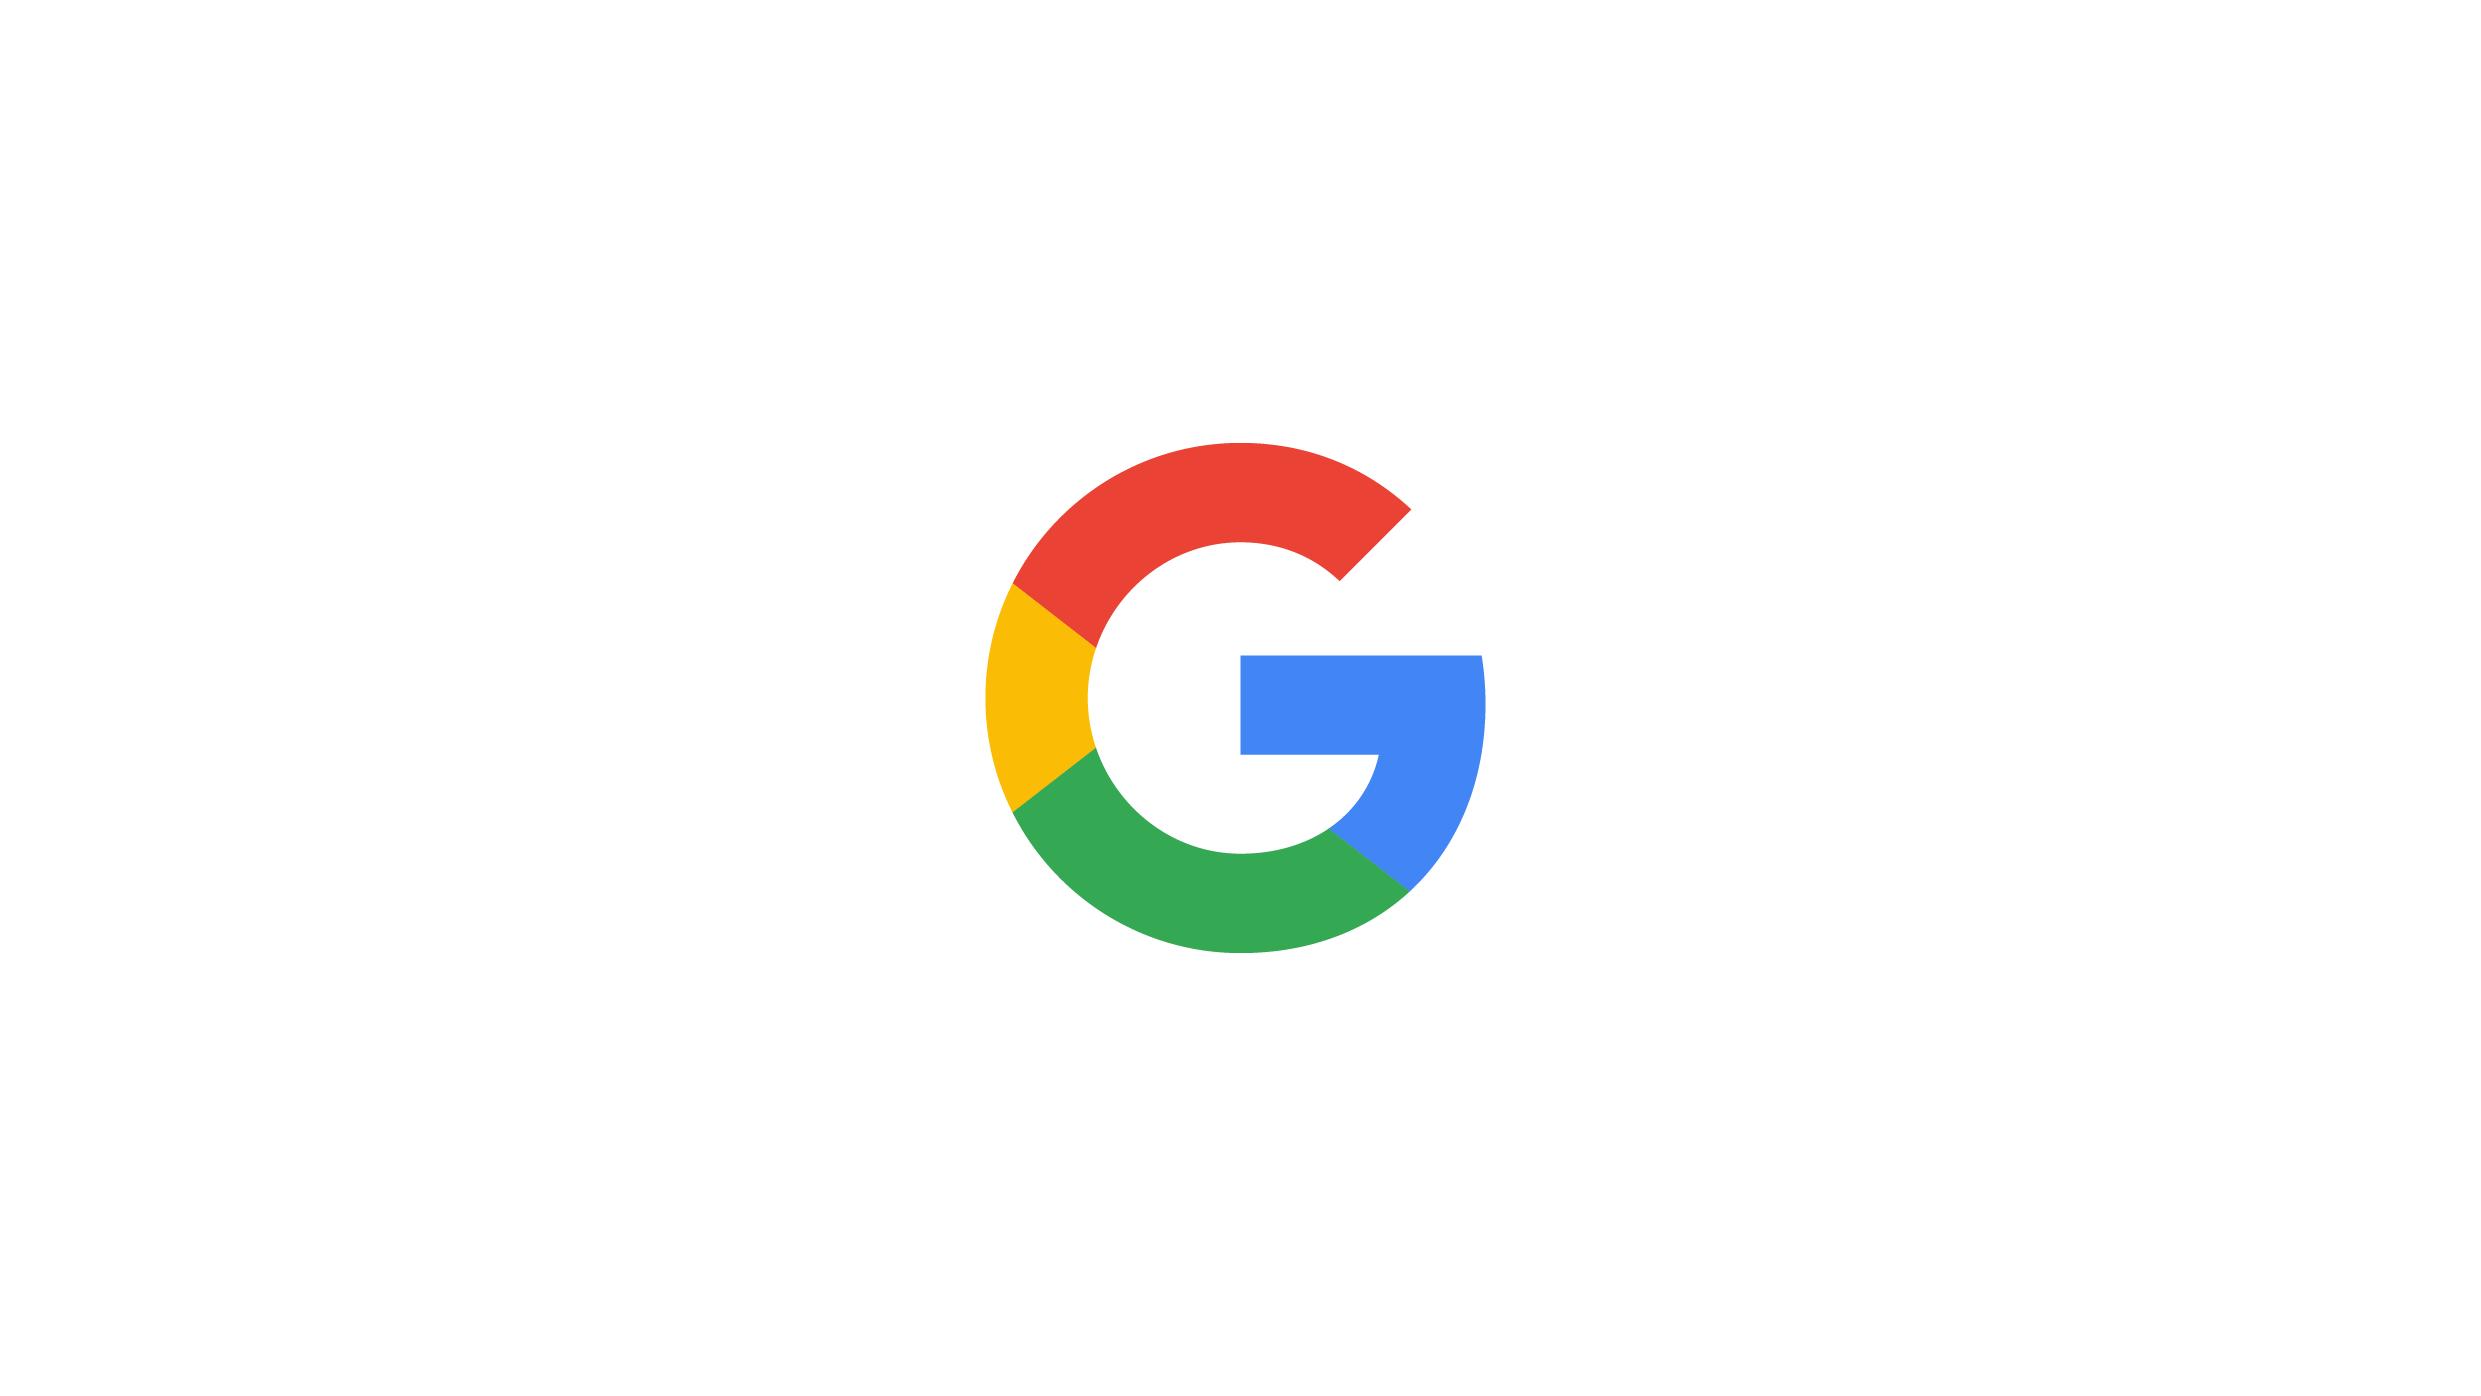 g-letter